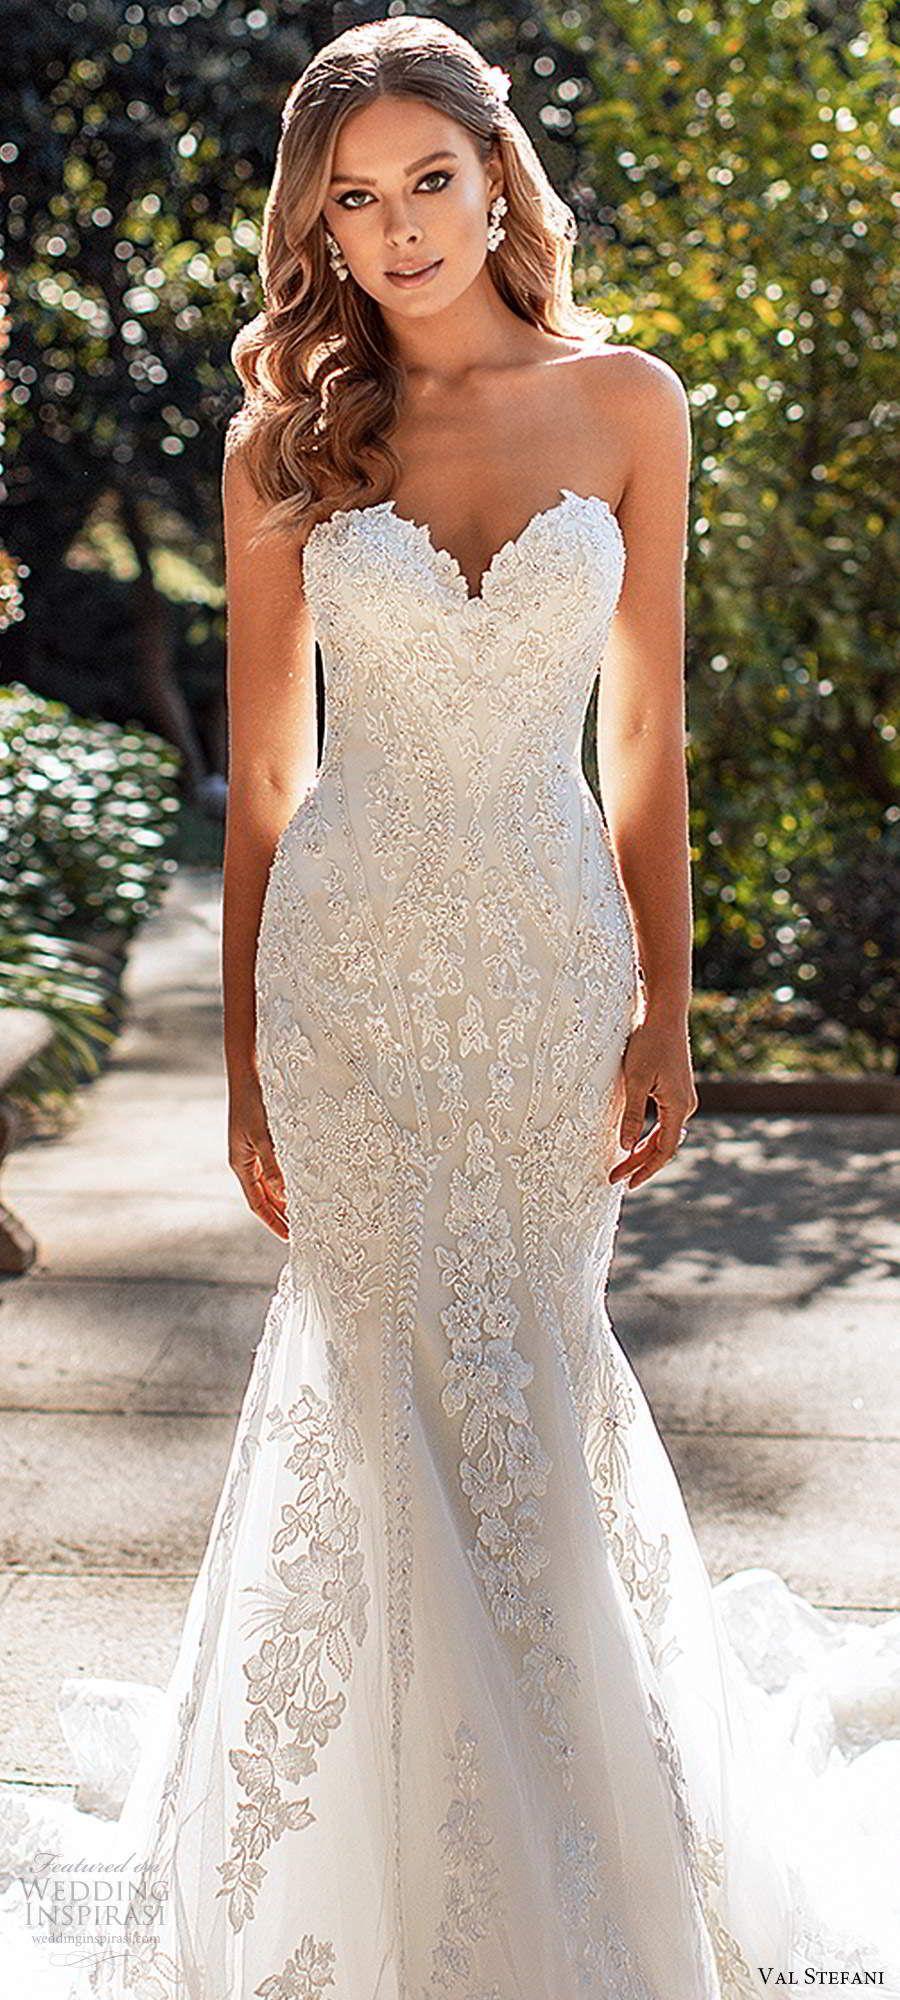 Val Stefani Fall 2020 Wedding Dresses Wedding Inspirasi Wedding Dresses Mermaid Sweetheart Mermaid Wedding Dress Sweetheart Wedding Dress [ 2000 x 900 Pixel ]